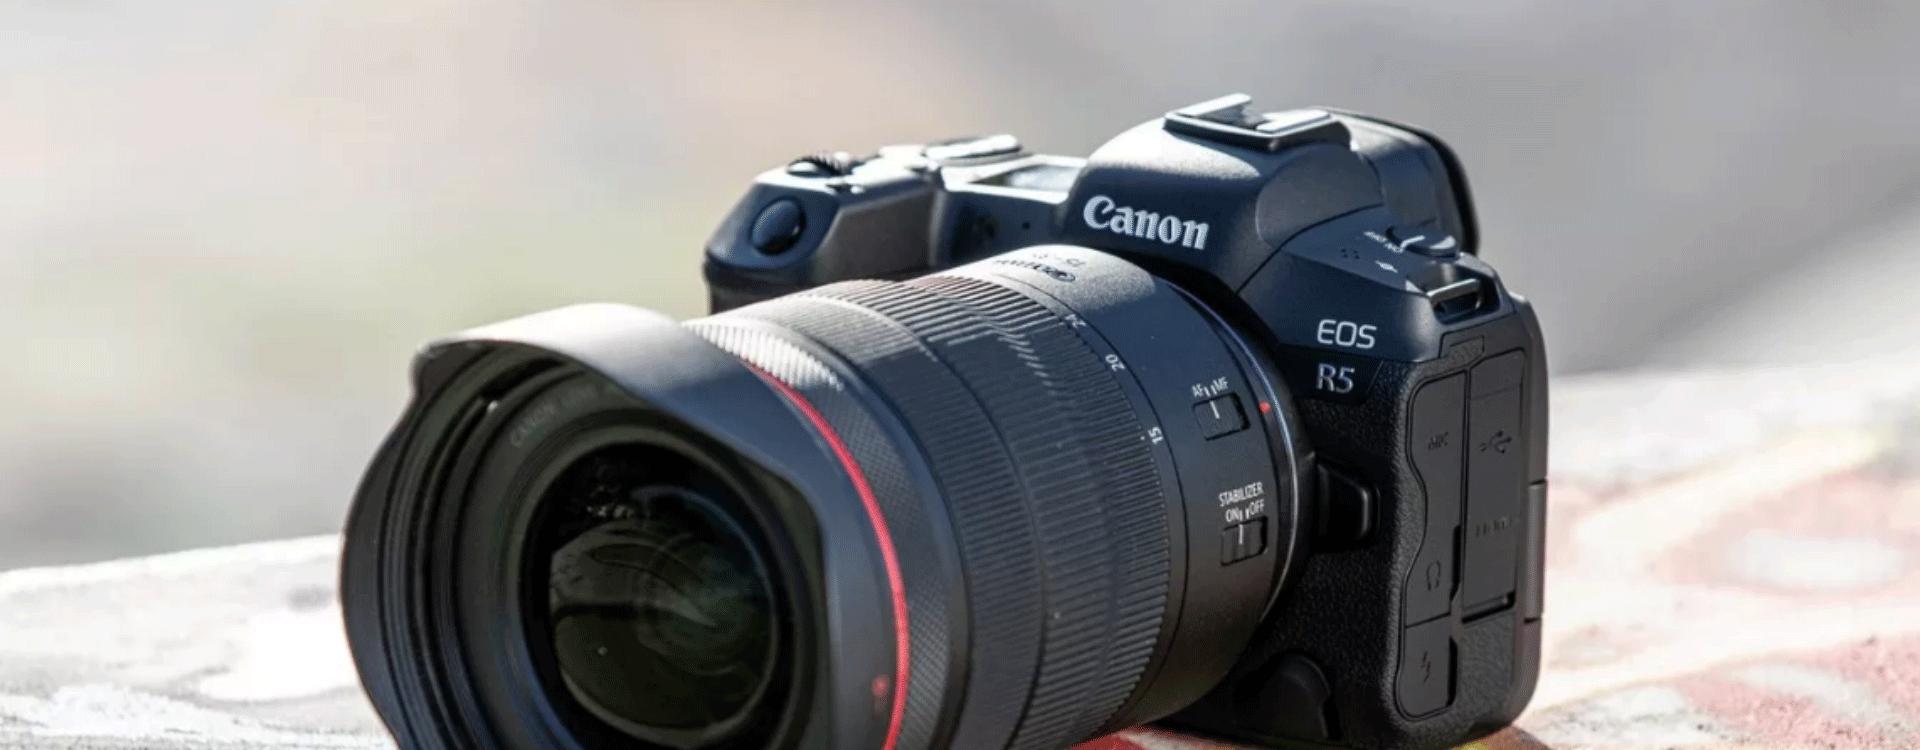 e-oko.pl - Autoryzowany sklep Canona